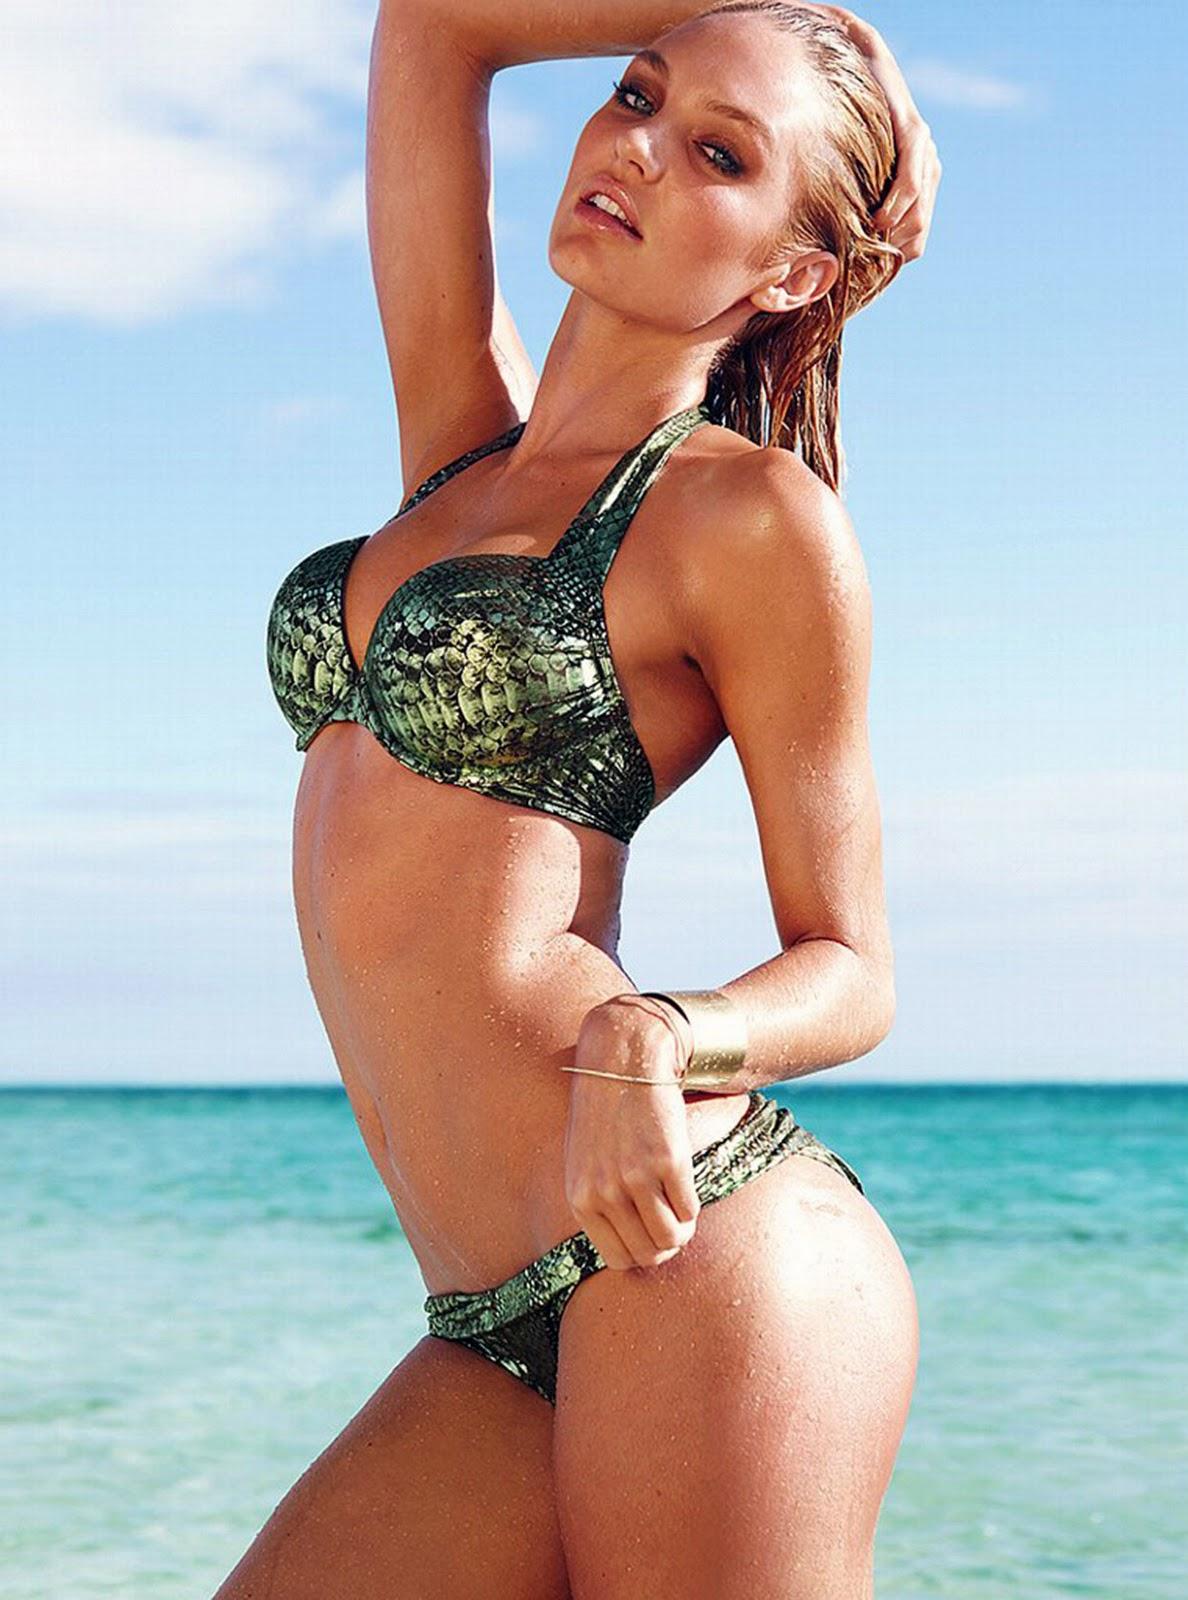 victoria secrets candice swanpoel in bikini